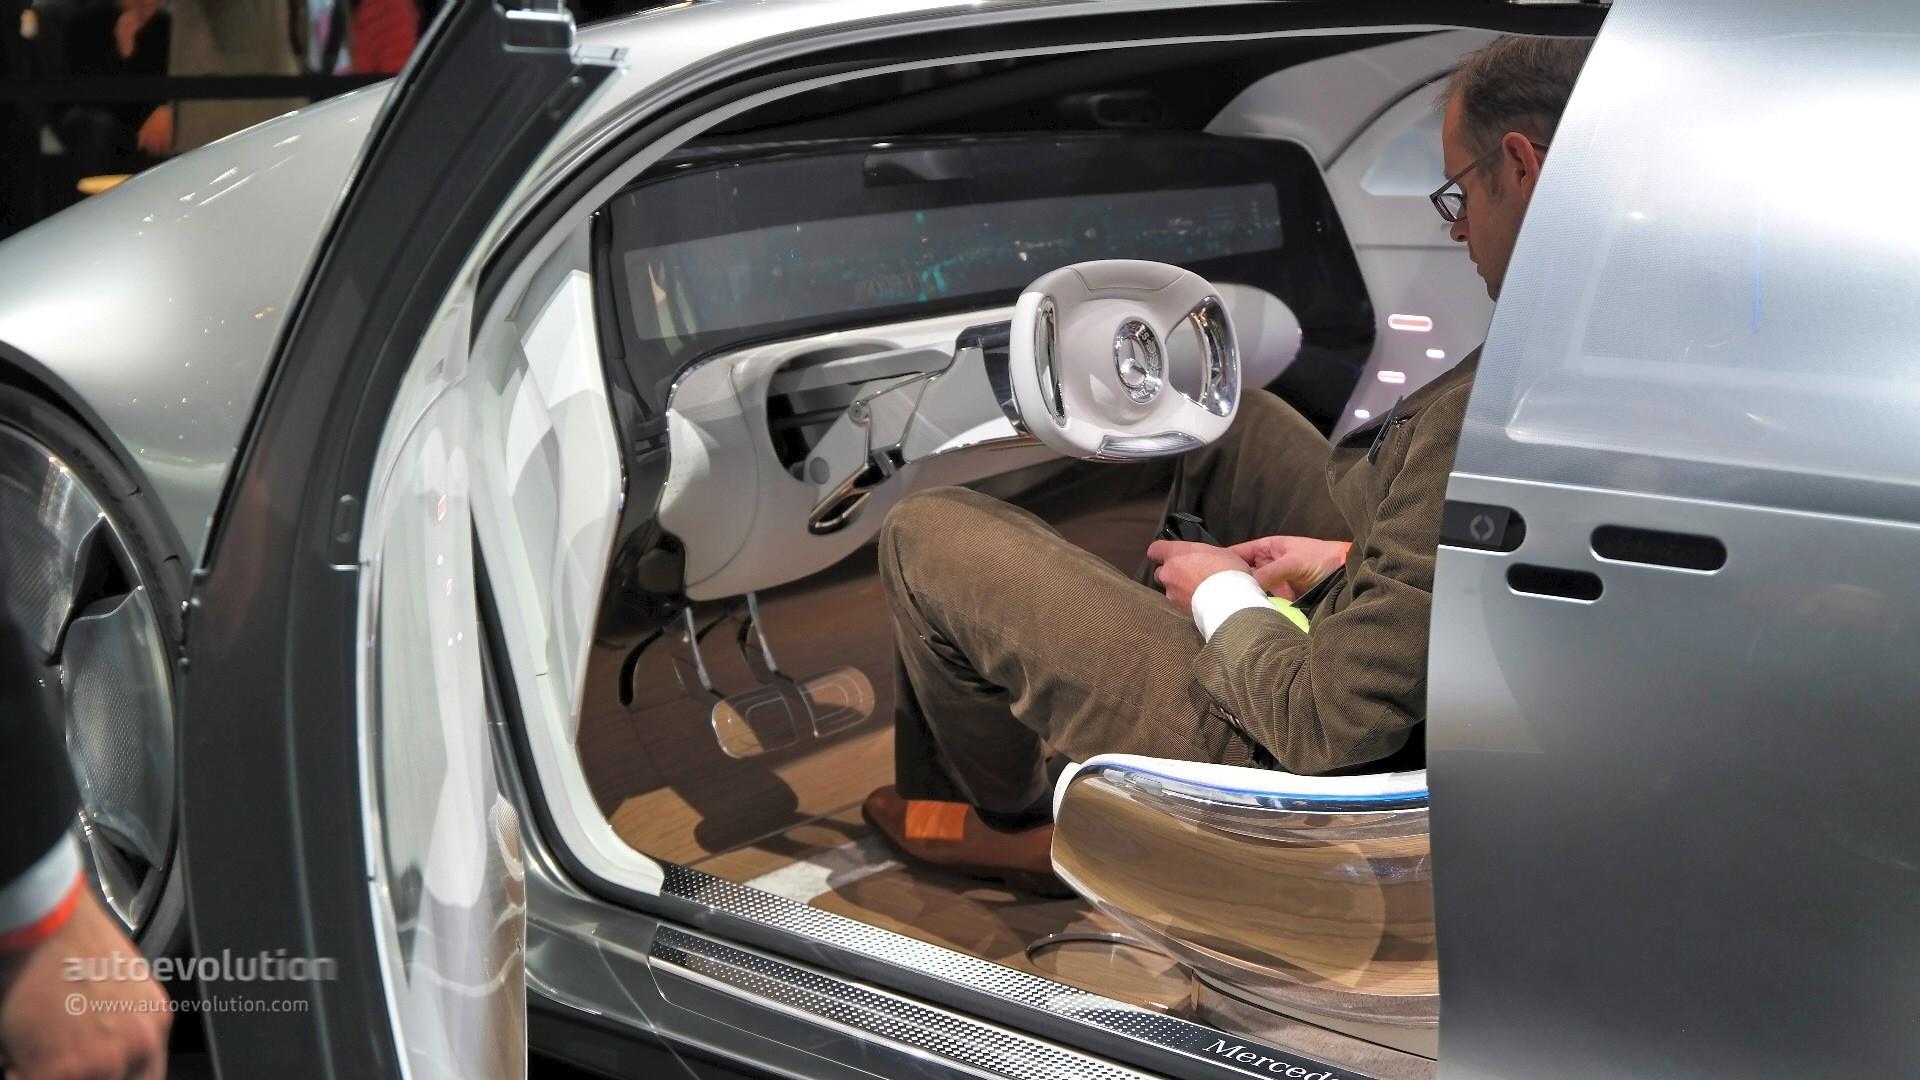 2015 Mercedes Suv >> Mercedes-Benz F 015 Concept Previews the Future at 2015 NAIAS [Live Photos] - autoevolution